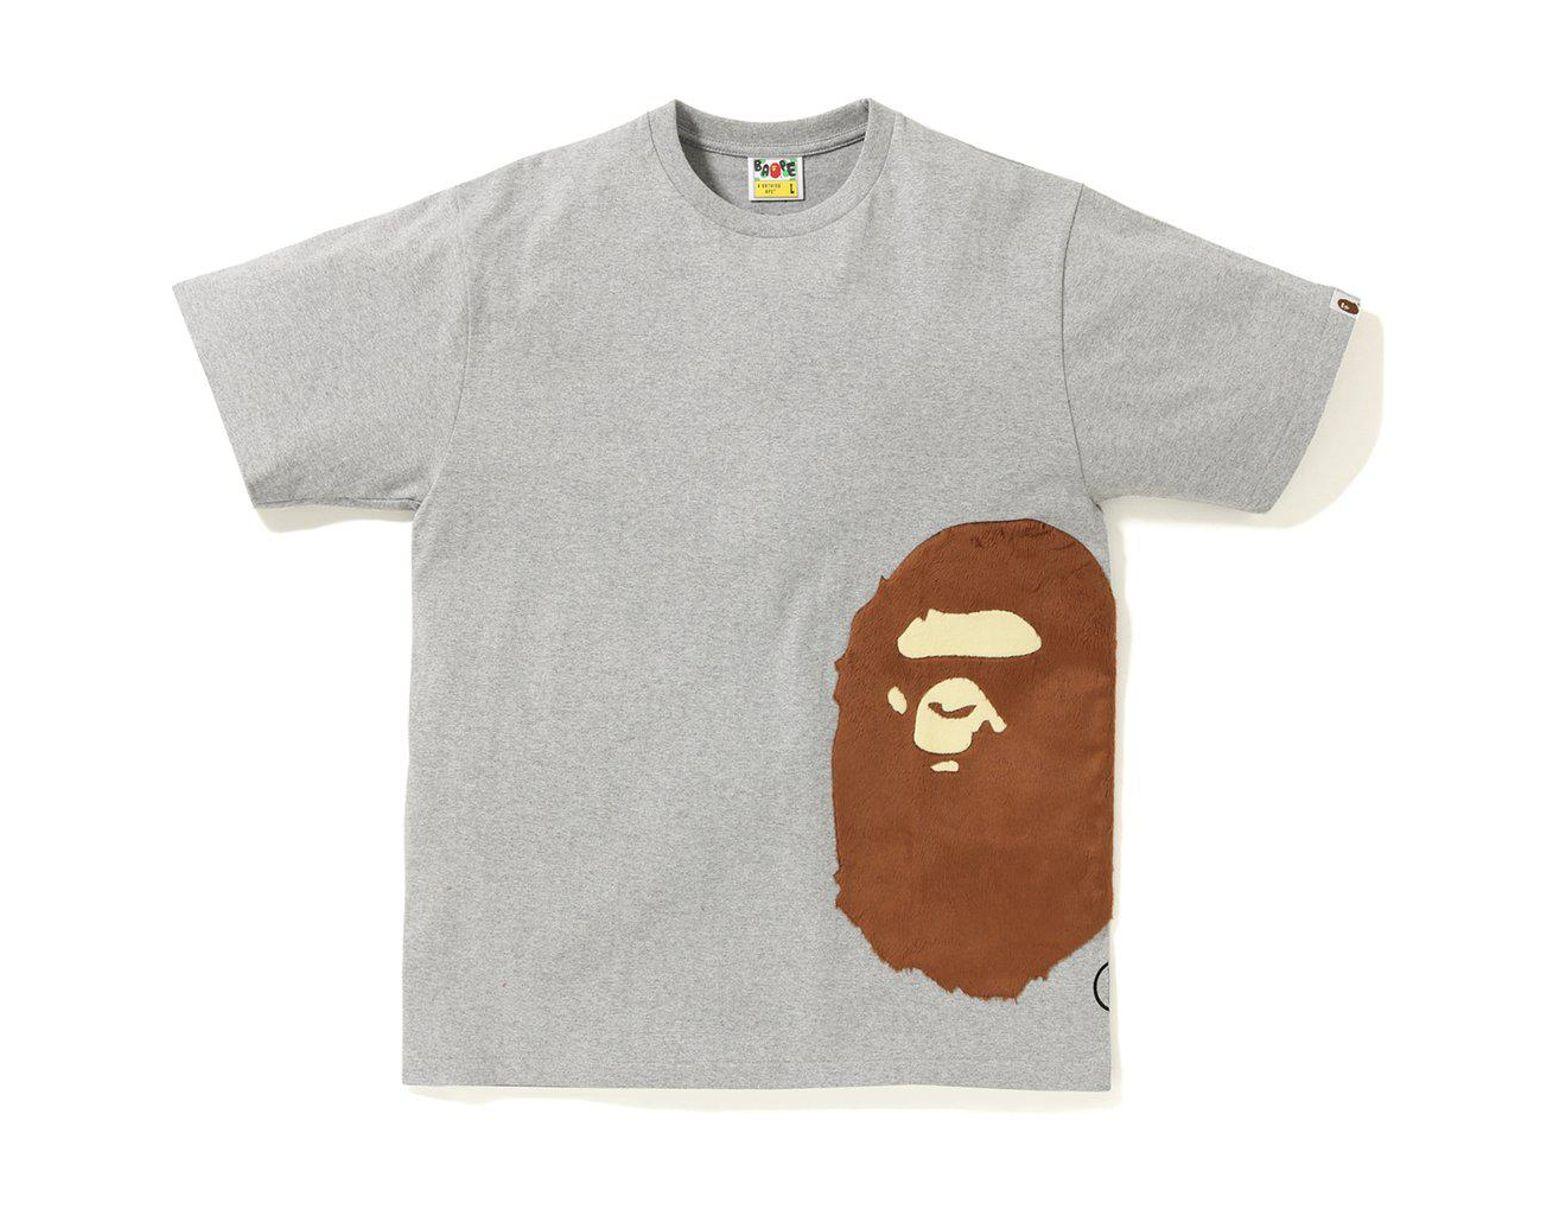 8f5737b6 A Bathing Ape Boa Side Big Ape Head Tee Grey in Gray for Men - Lyst